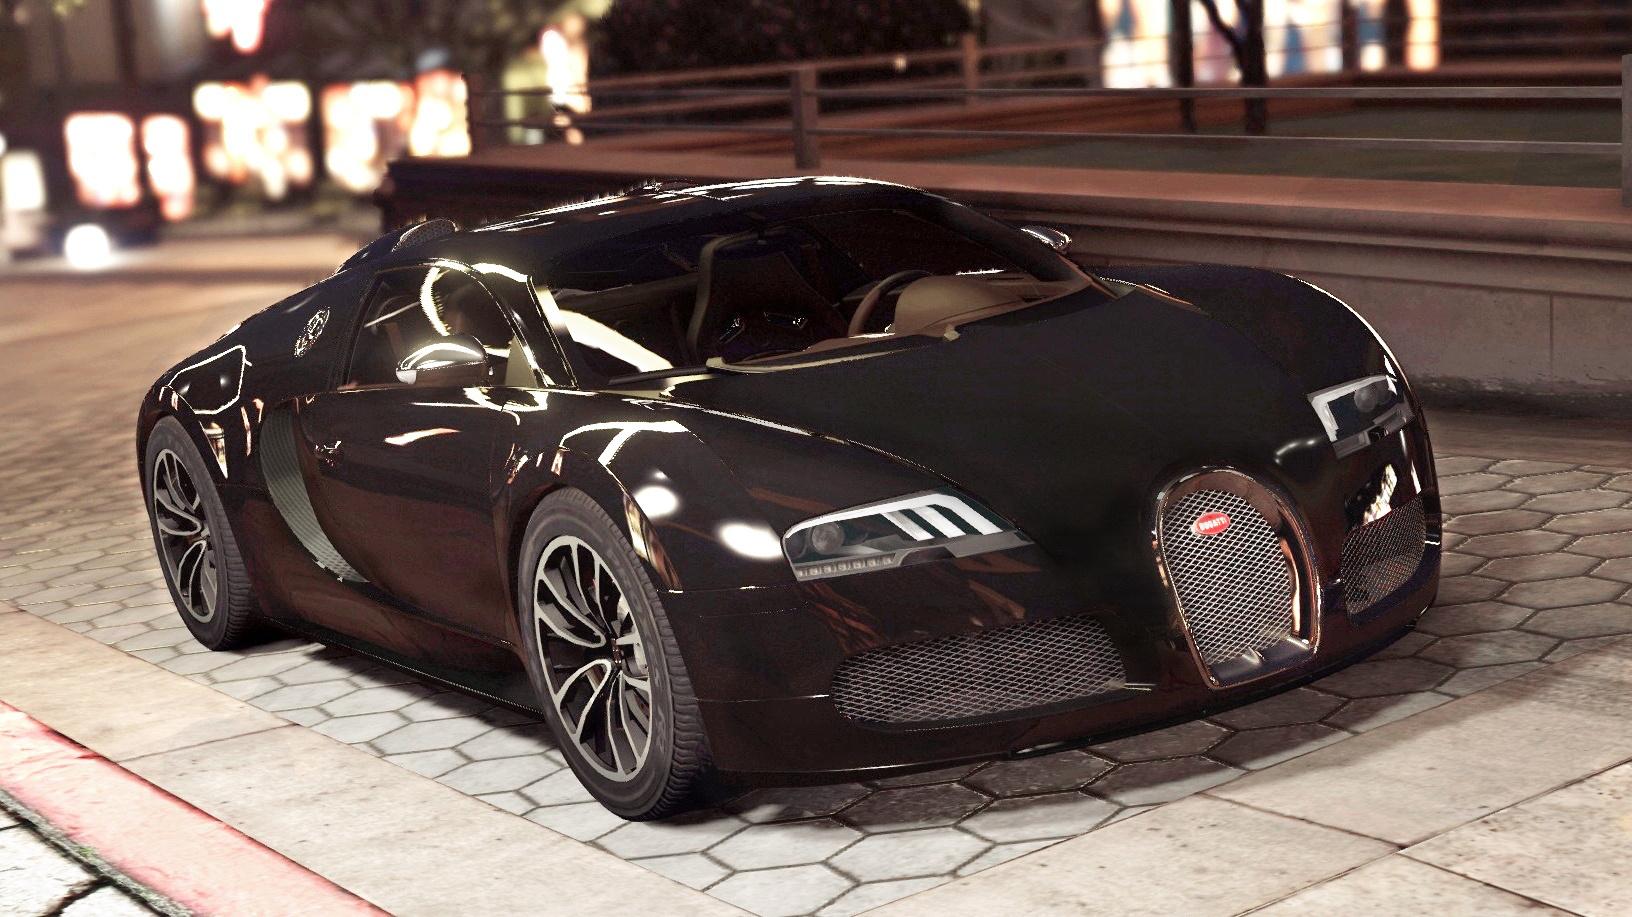 Bugatti Veyron Sang Noir [Add-On | Autovista] - GTA5-Mods.com